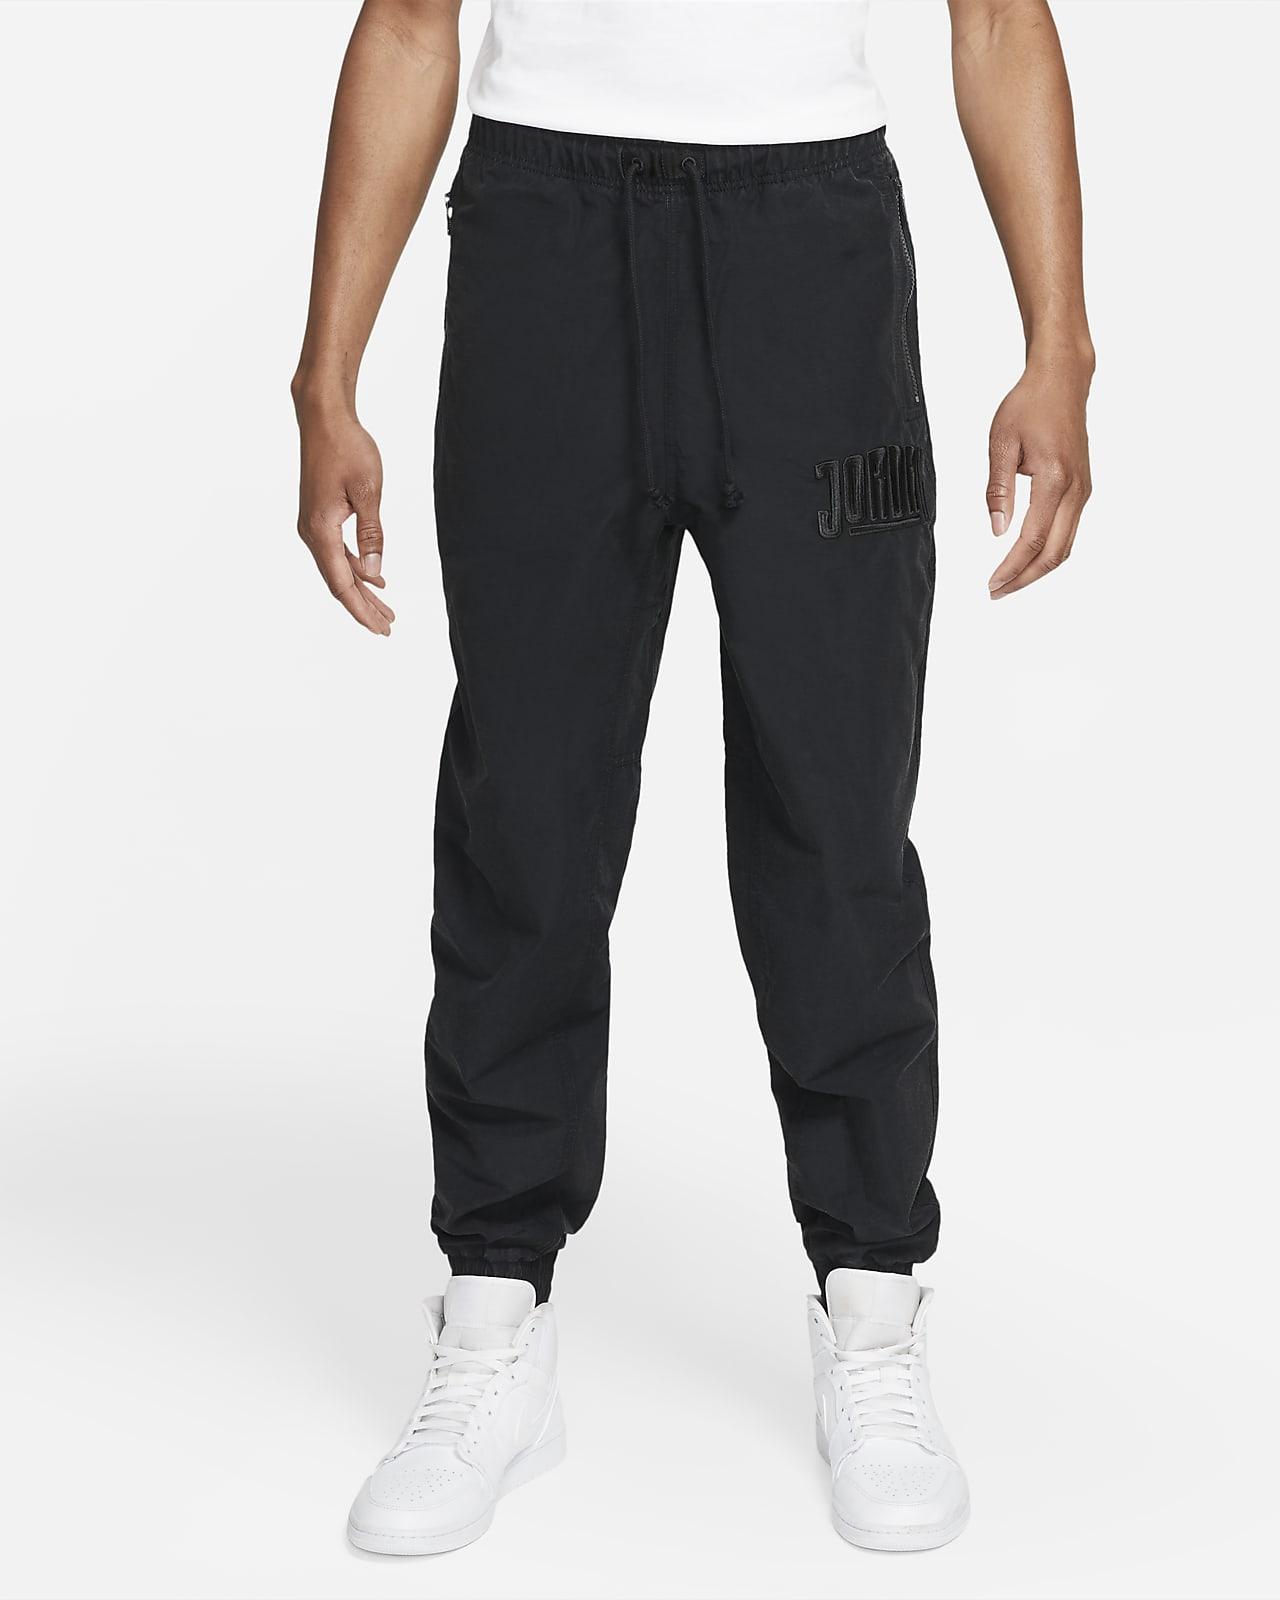 Jordan Sport DNA Men's Woven Trousers